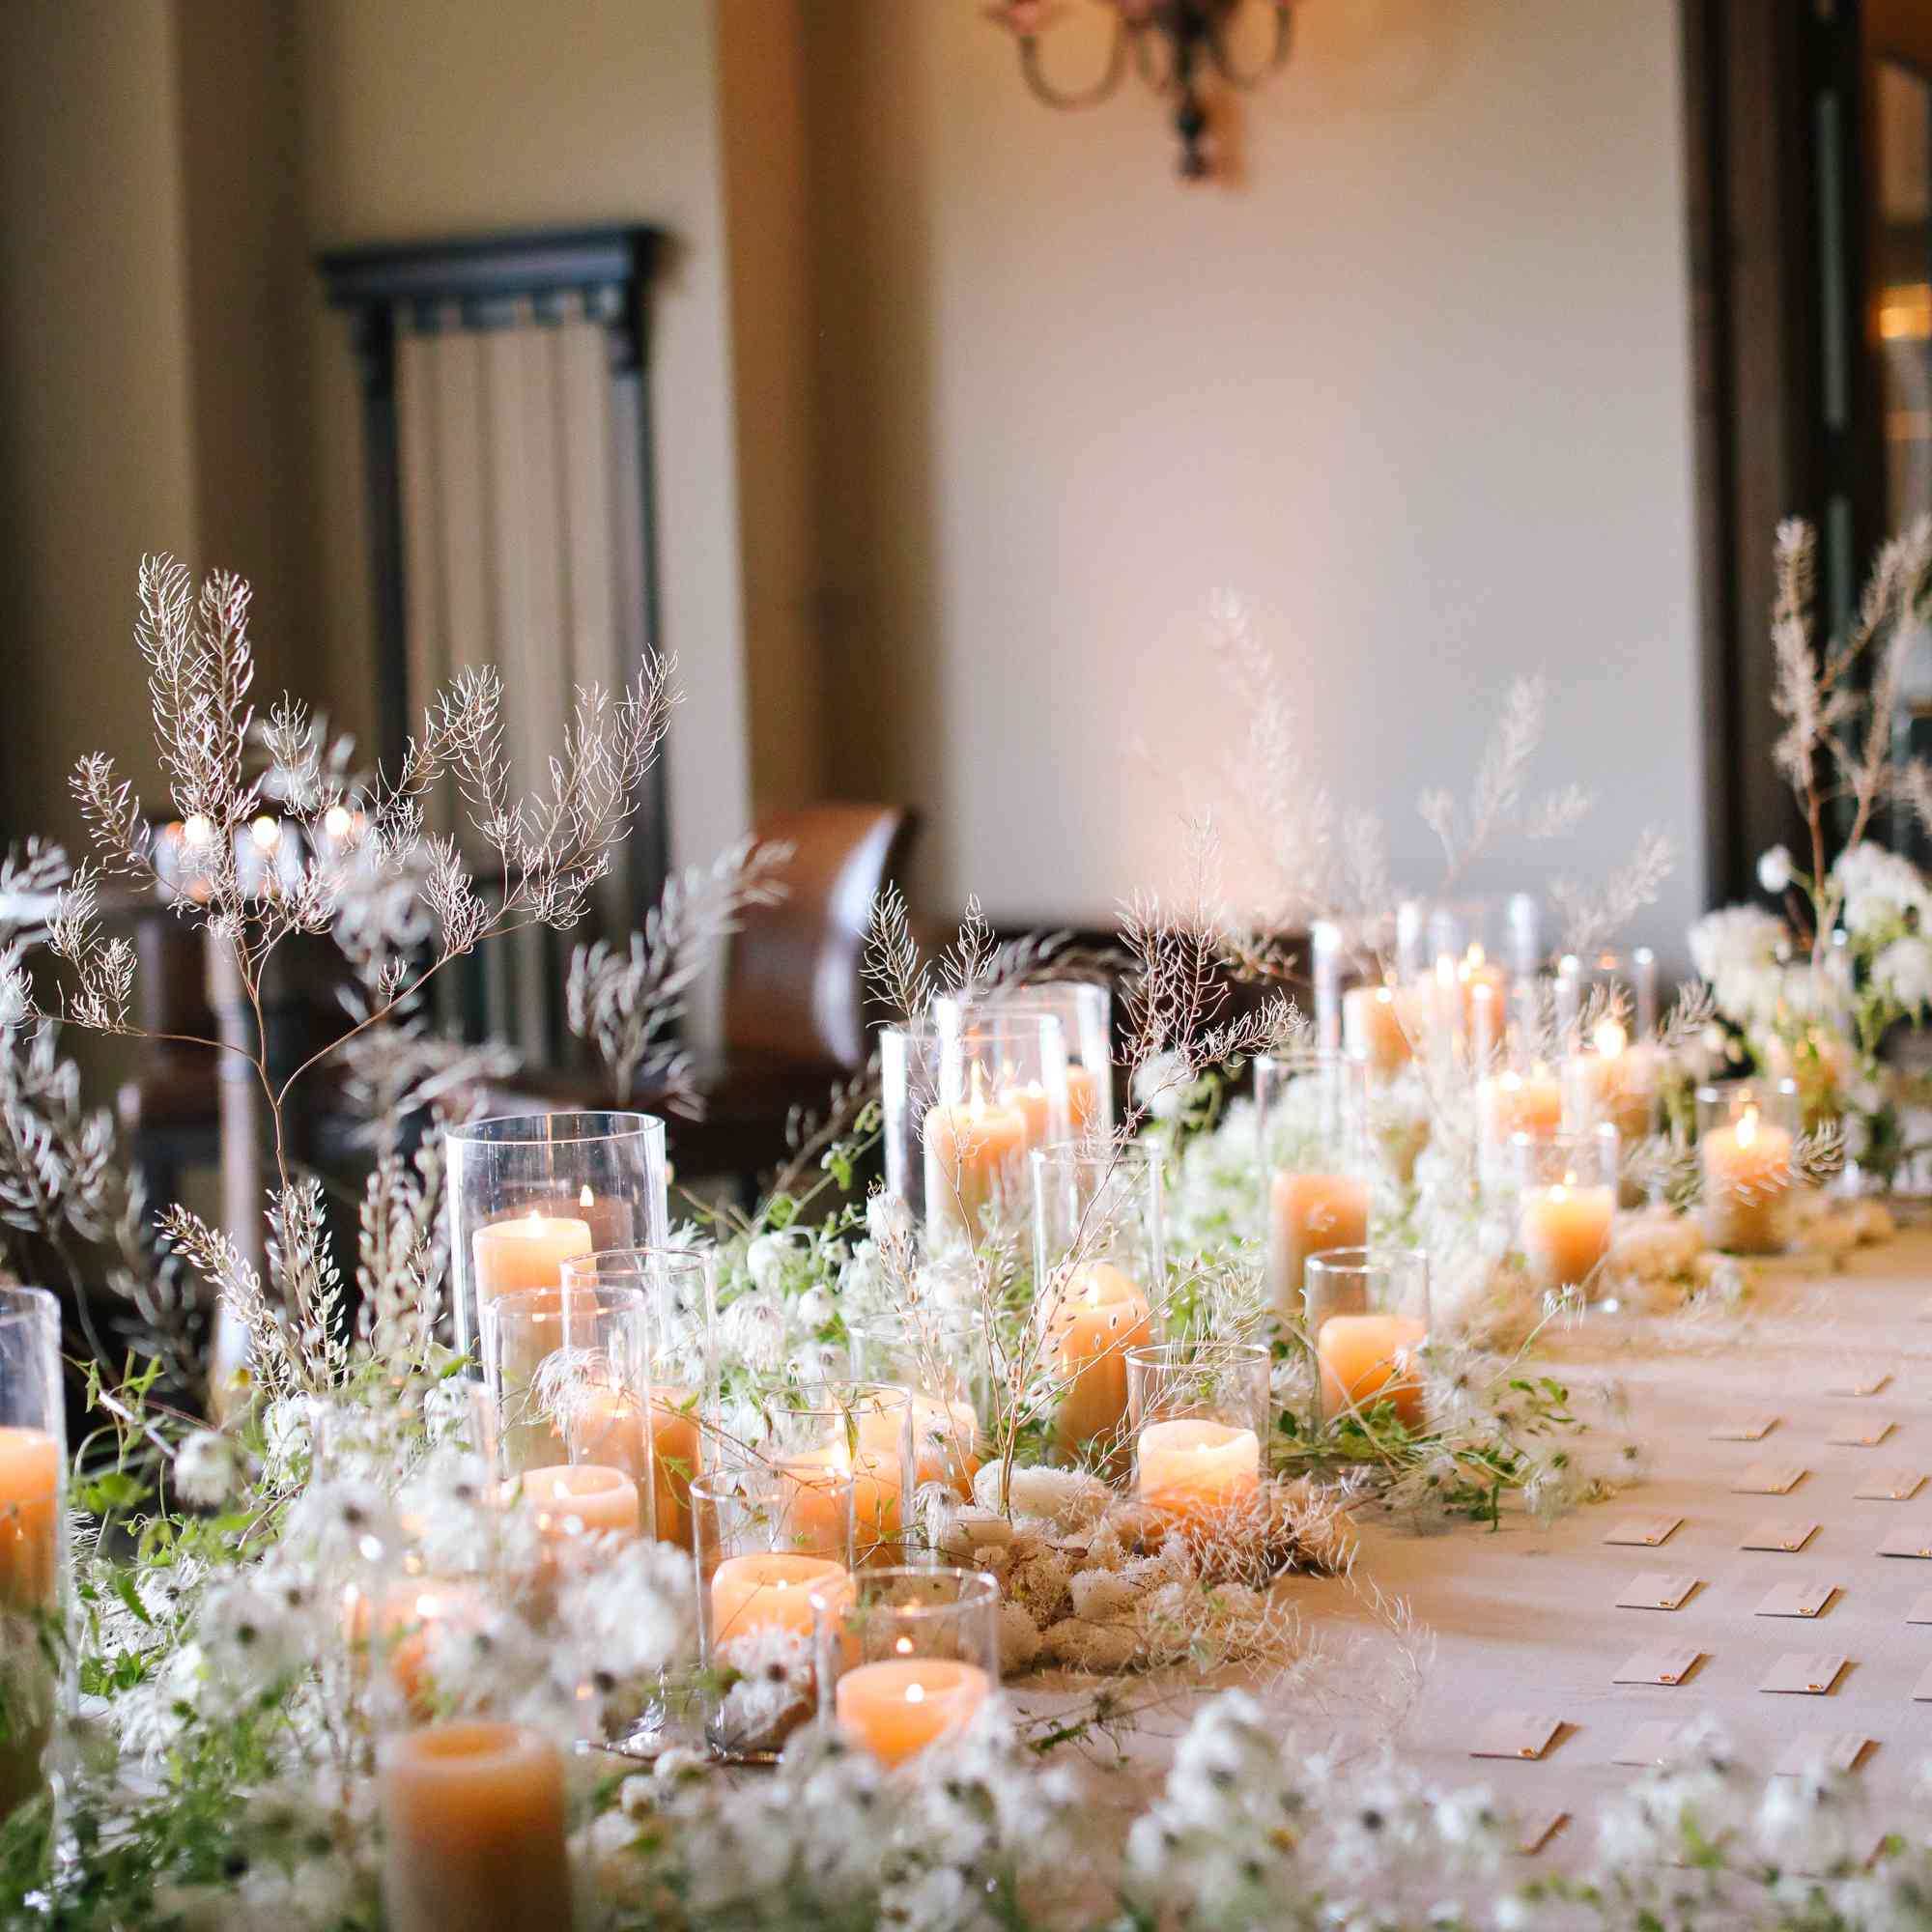 savannah and riker wedding, escort card display